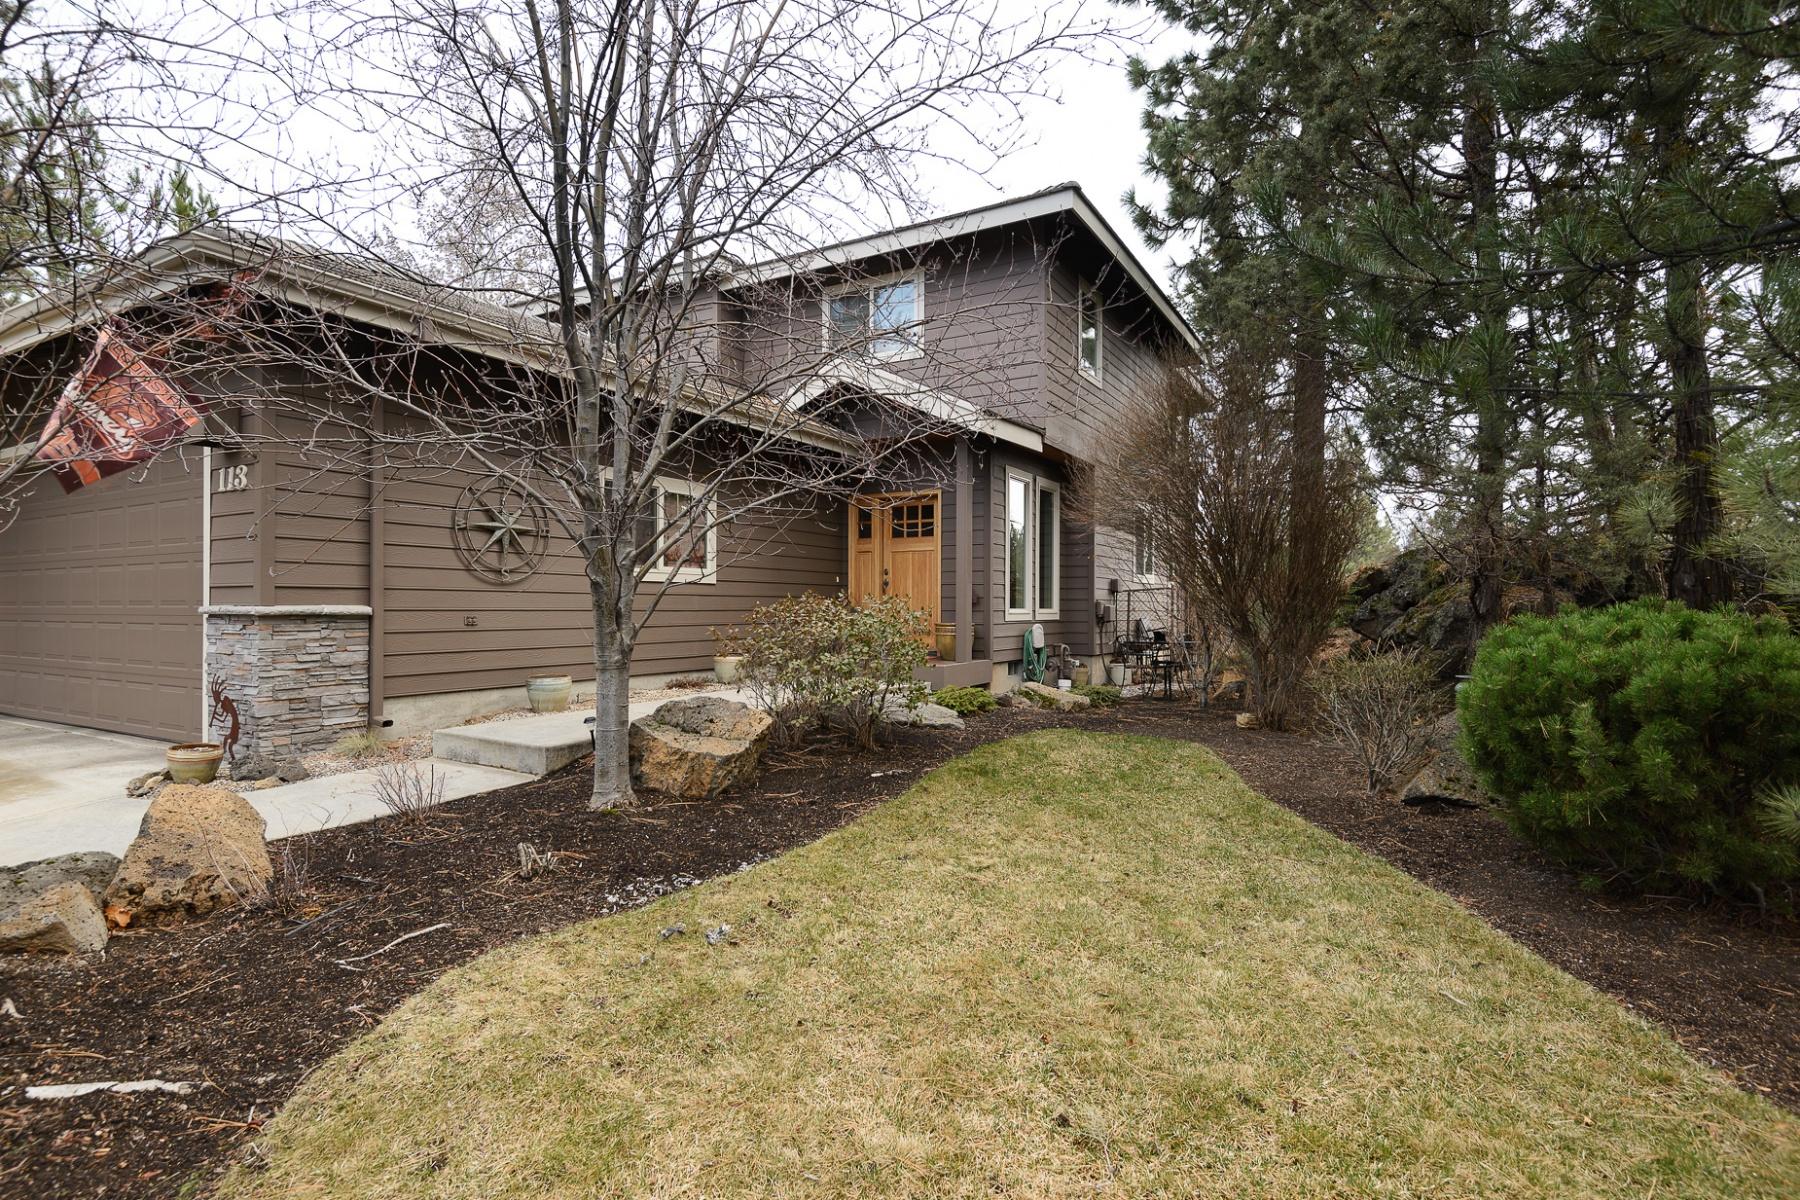 联栋屋 为 销售 在 Private Townhome in NW Bend 113 NW Gander Ct 本德, 俄勒冈州, 97701 美国